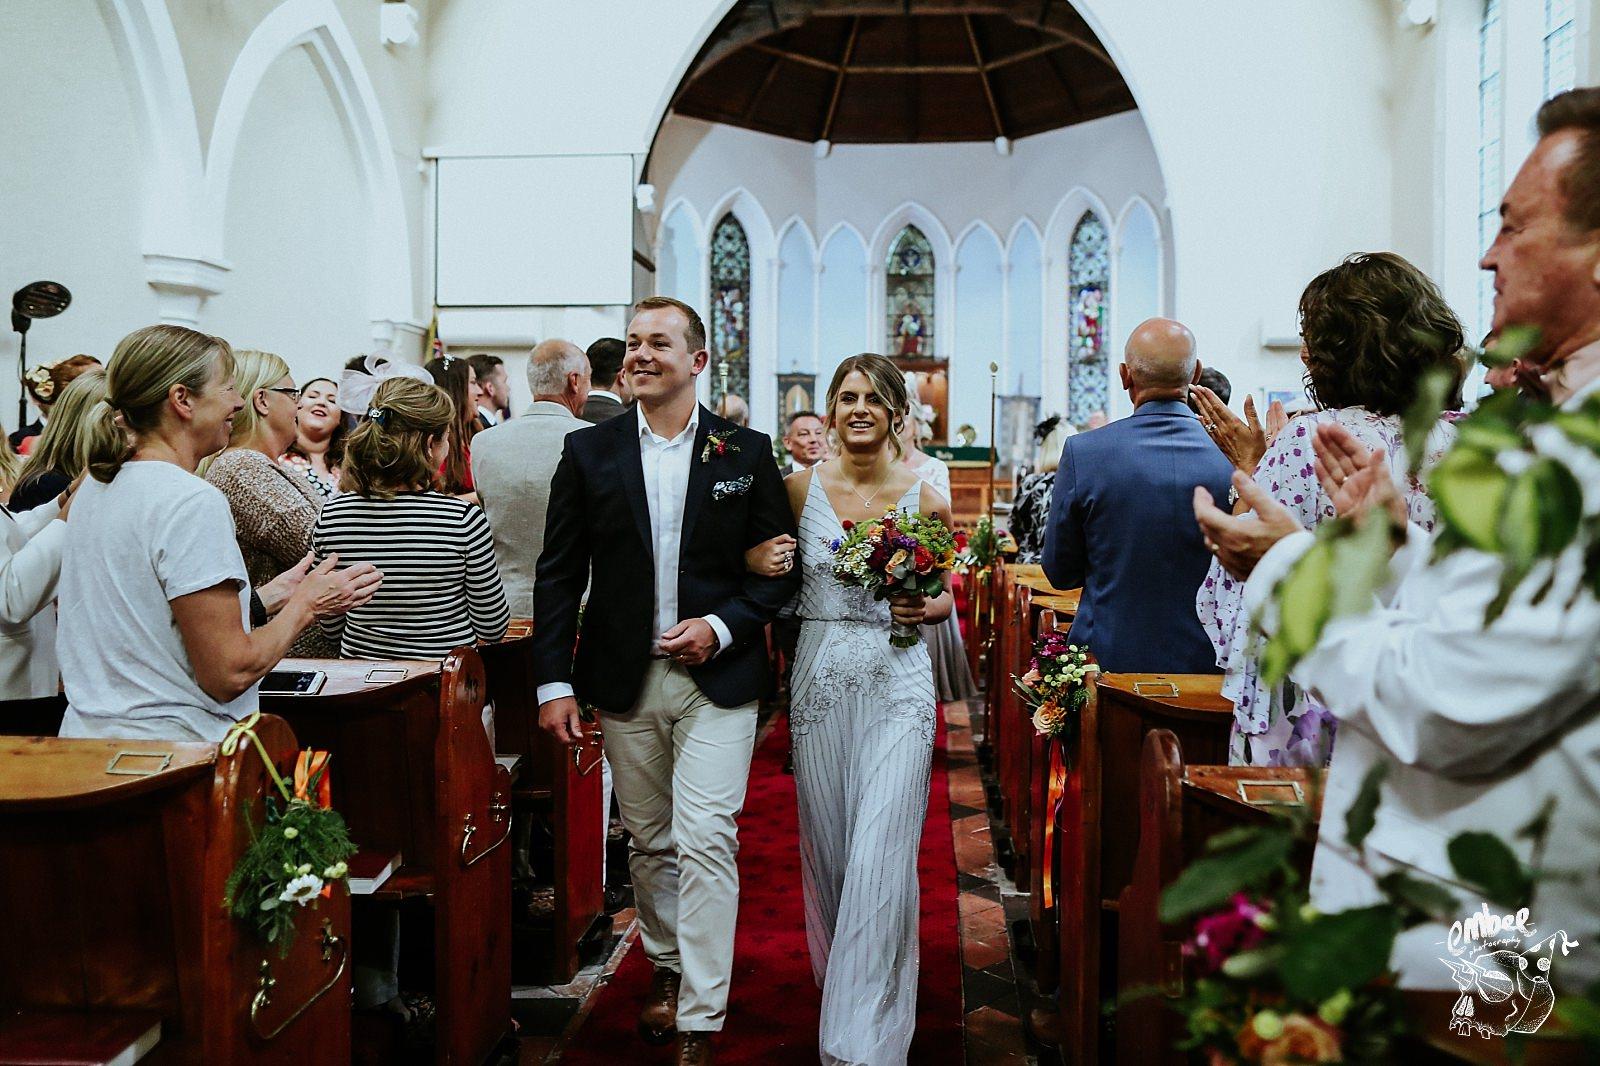 wedding party leaving church